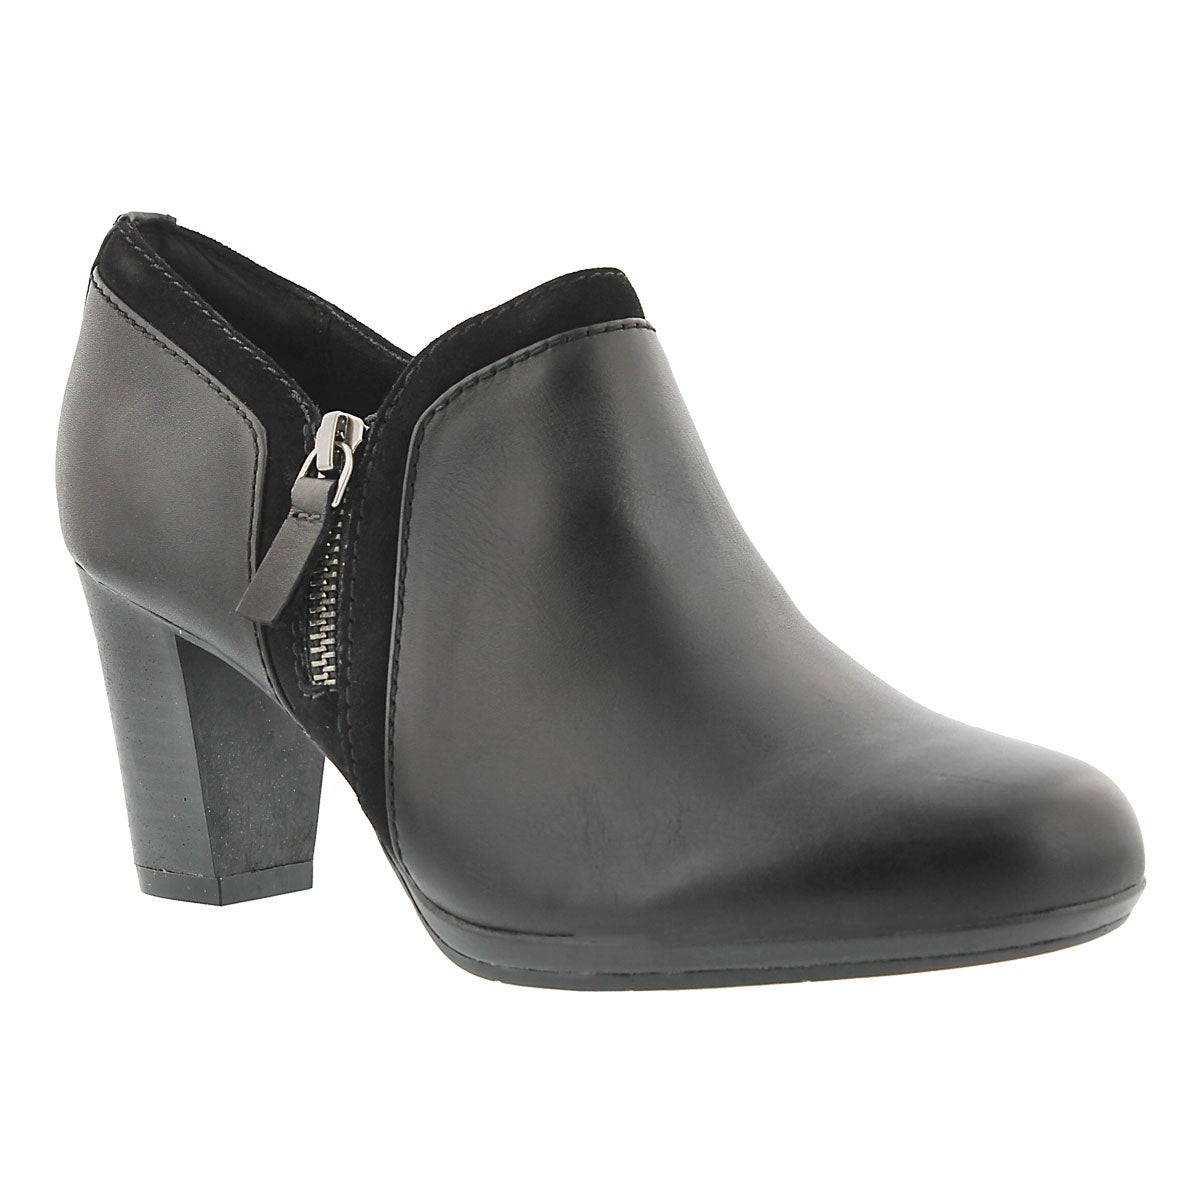 Chaussures Brynn Fern, noir, femmes